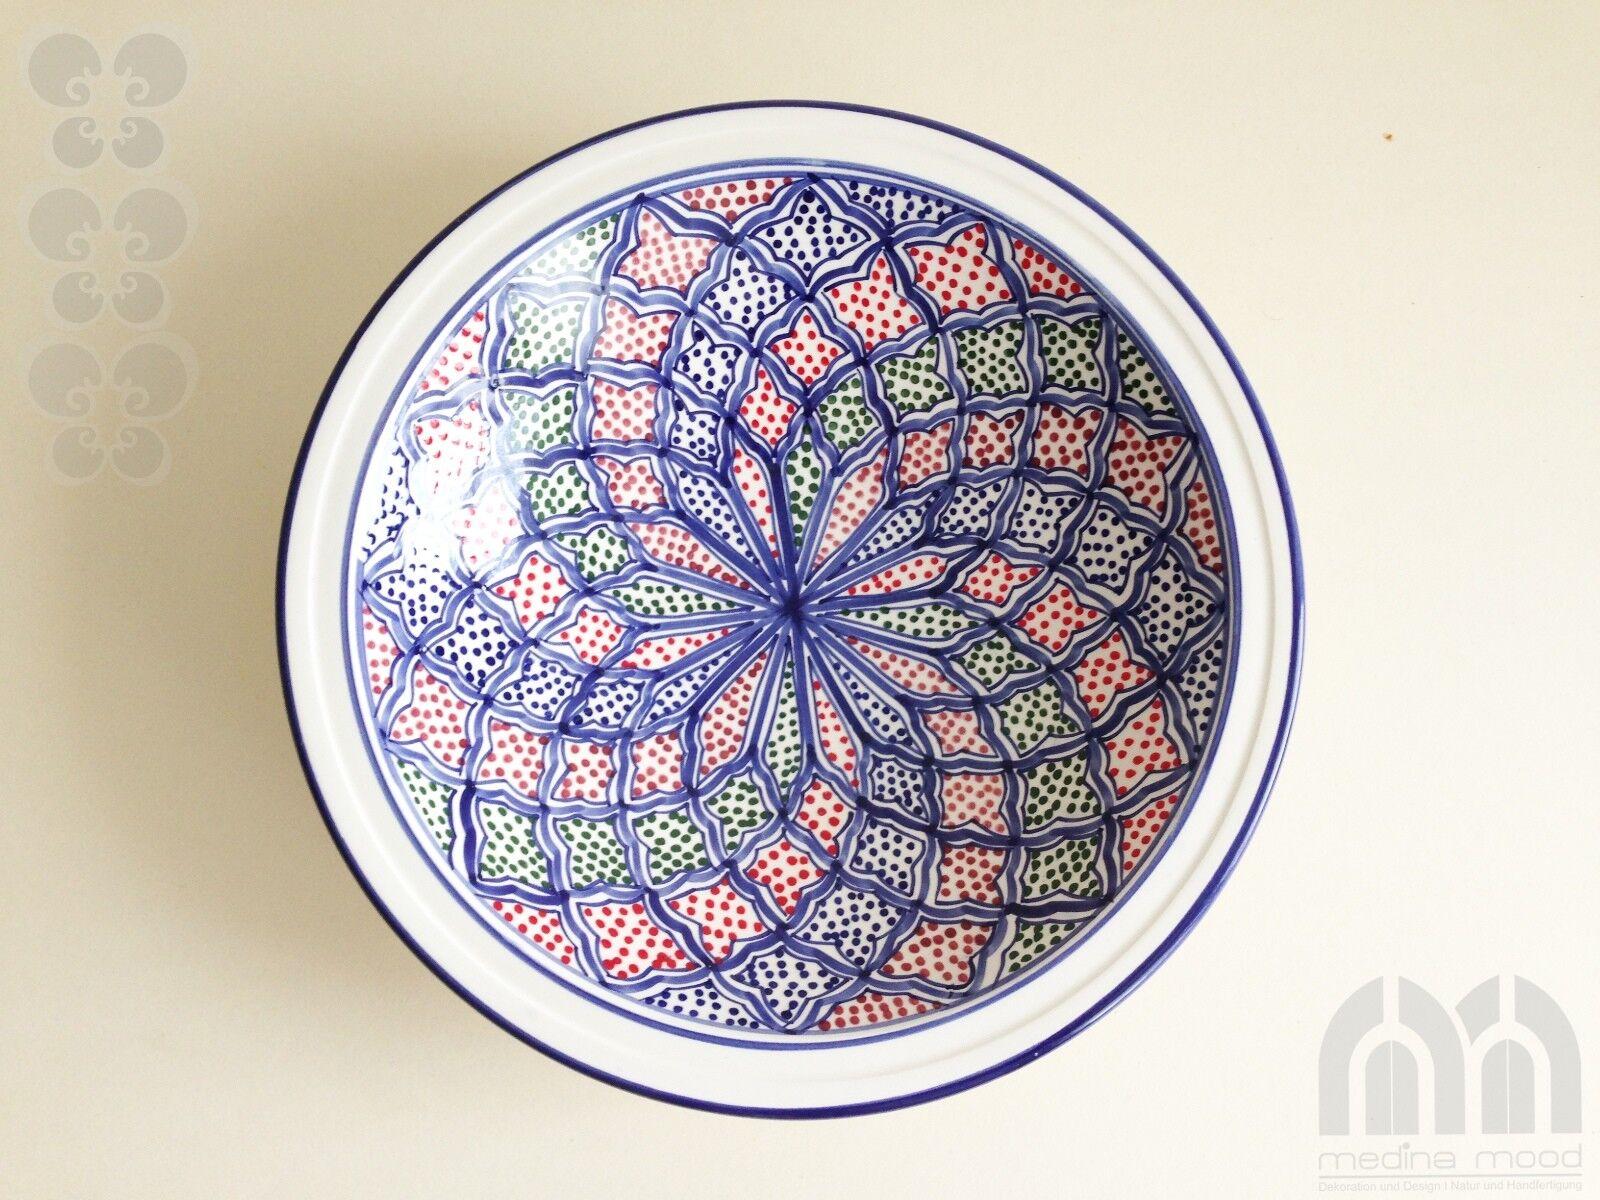 Schale Keramik Ø 32 cm handbemalt, Obstschale, Deko, orientalisch, Handarbeit